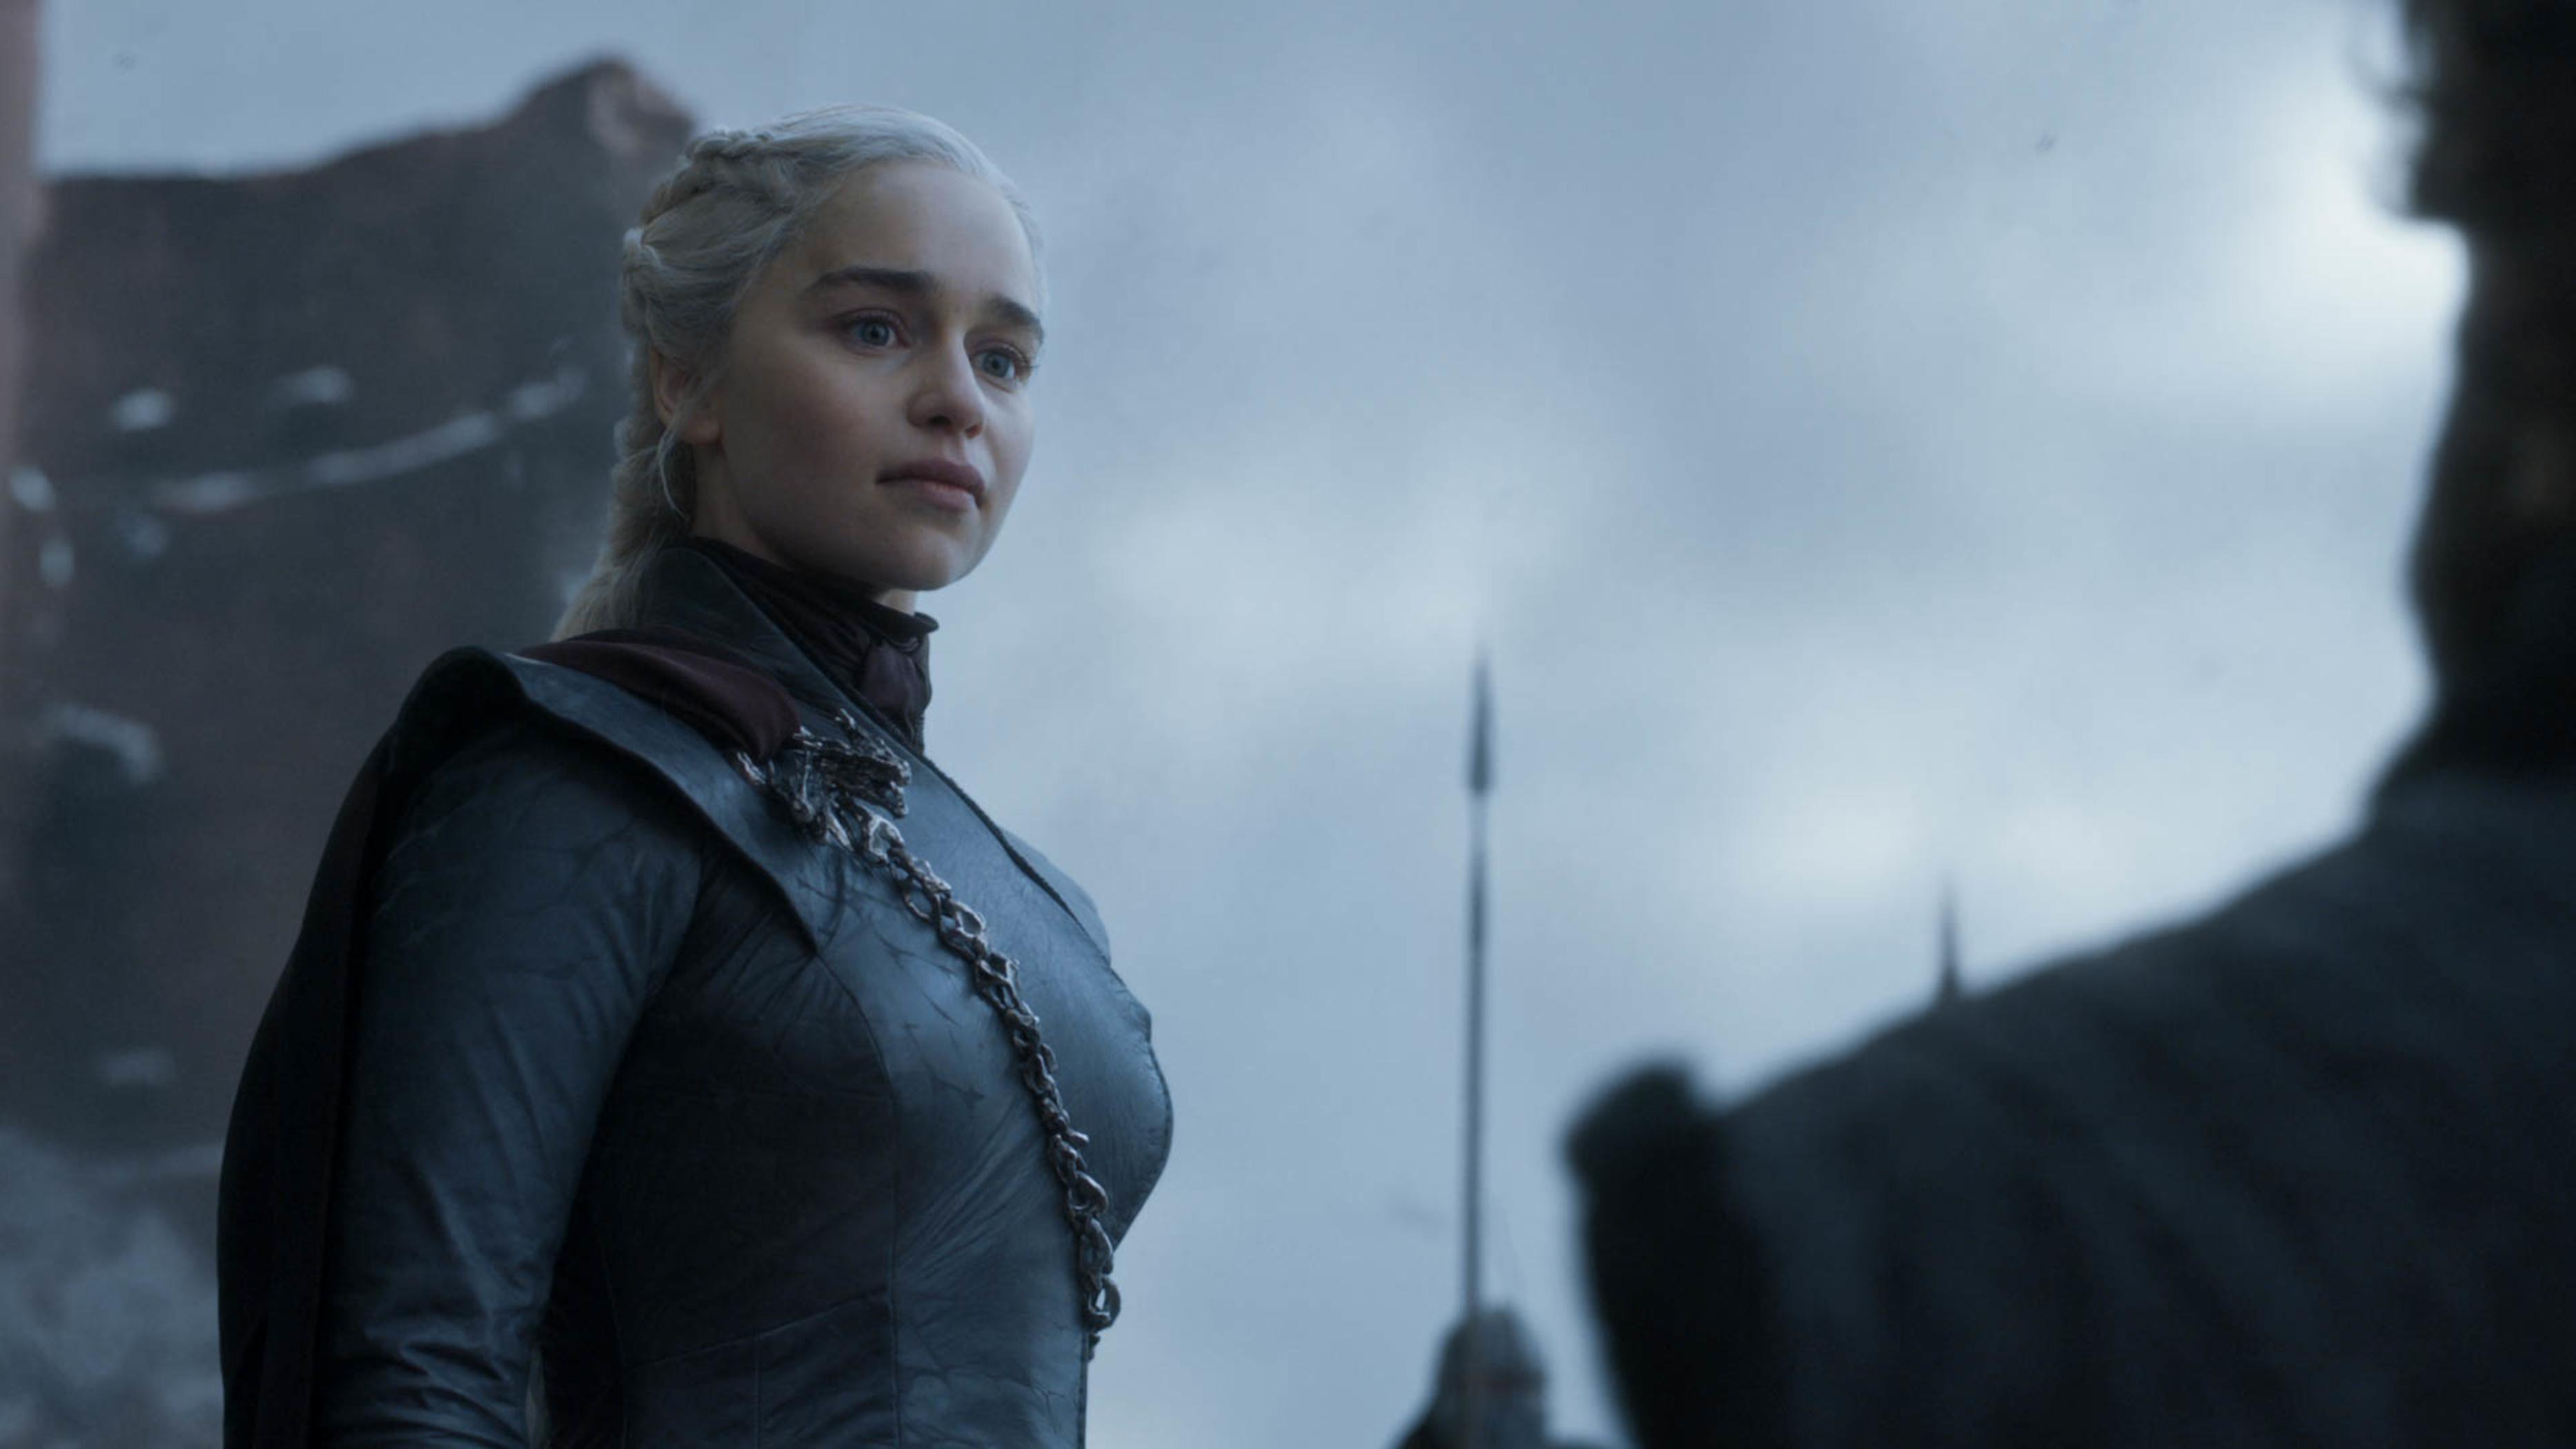 Emilia Clarke as Daenerys Targaryen in the series finale of Game of Thrones.